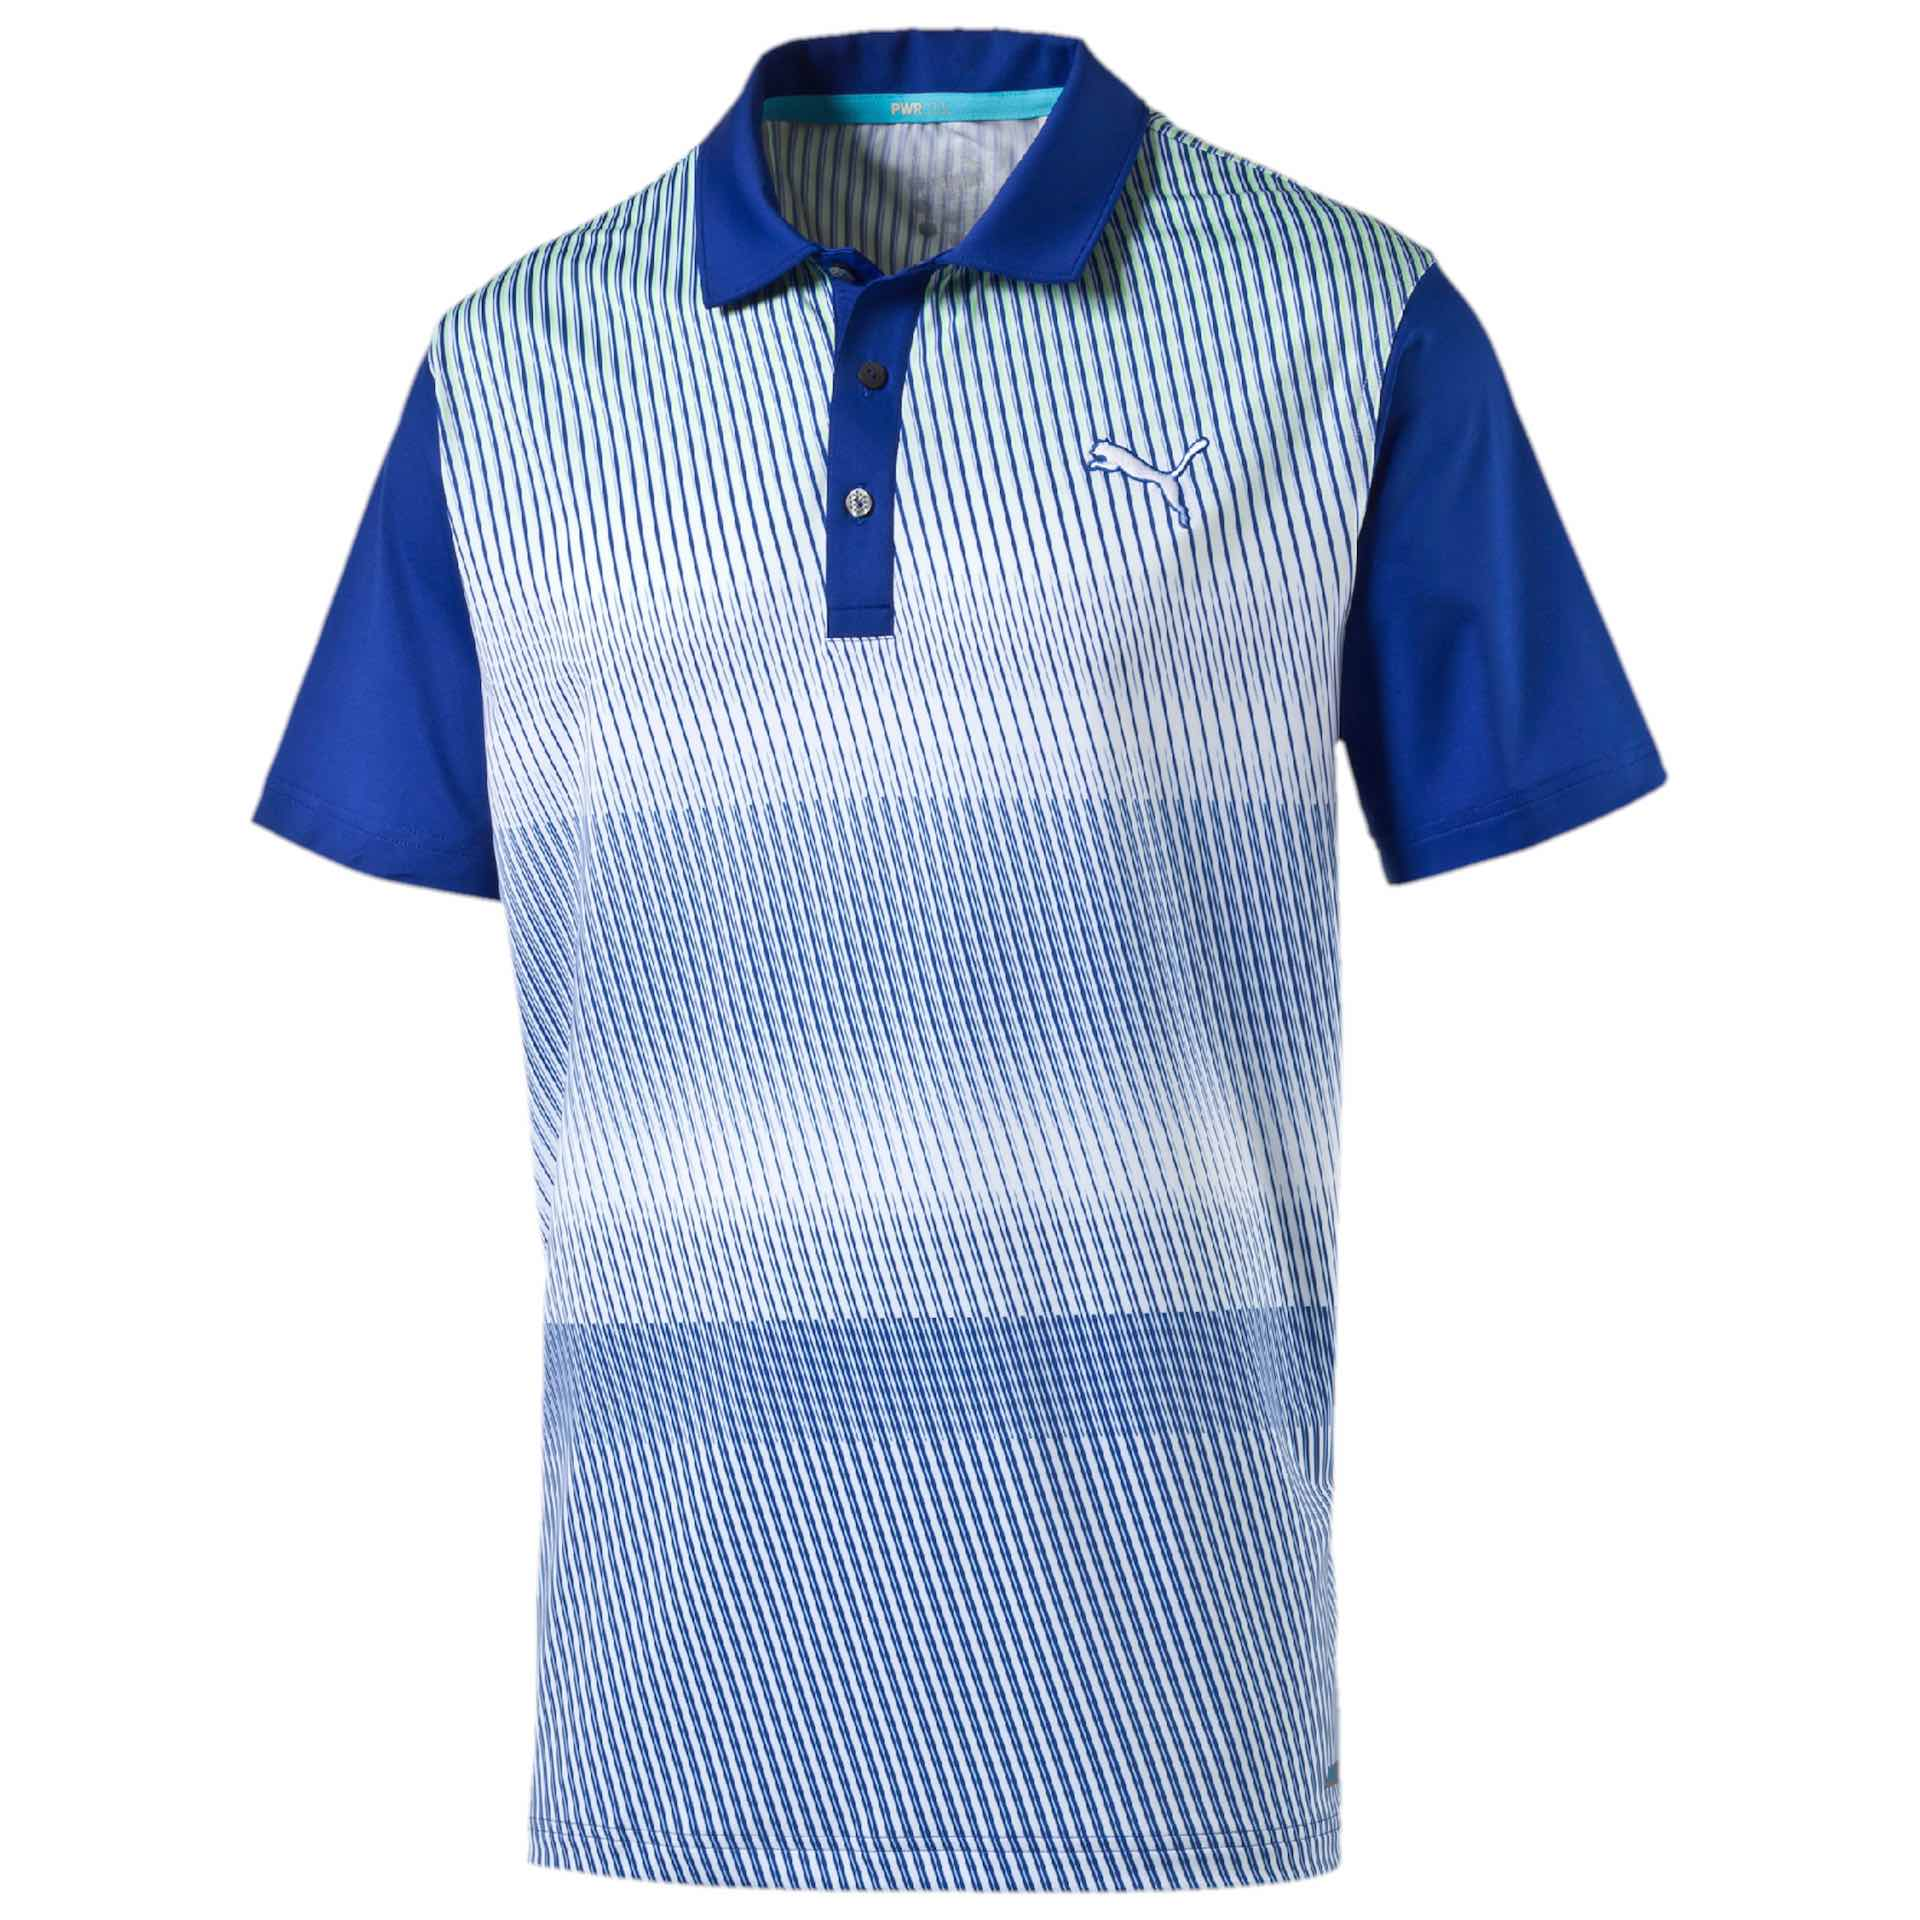 Puma Golf Spring/Summer 2016